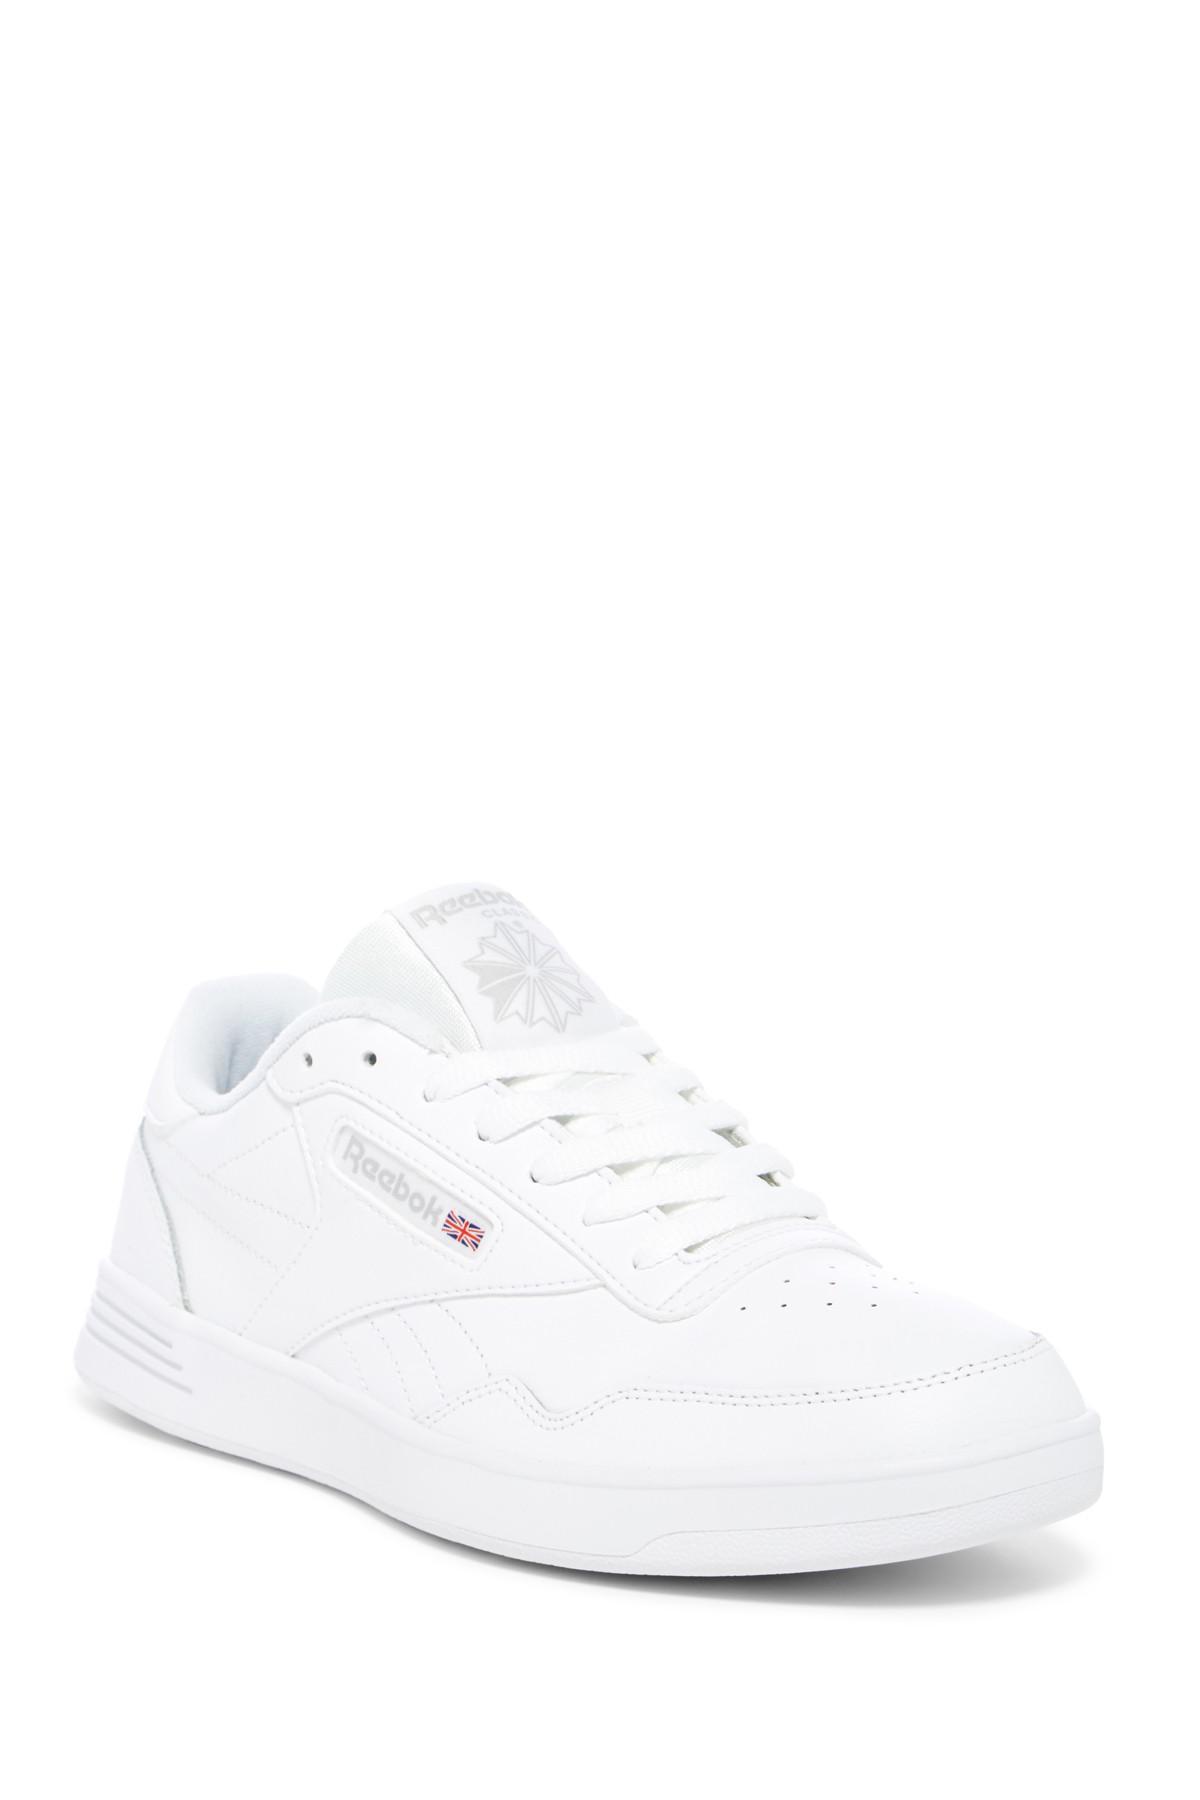 c11900221717 Reebok - White Classic Club Memt Leather Sneaker - Wide Width for Men - Lyst.  View fullscreen